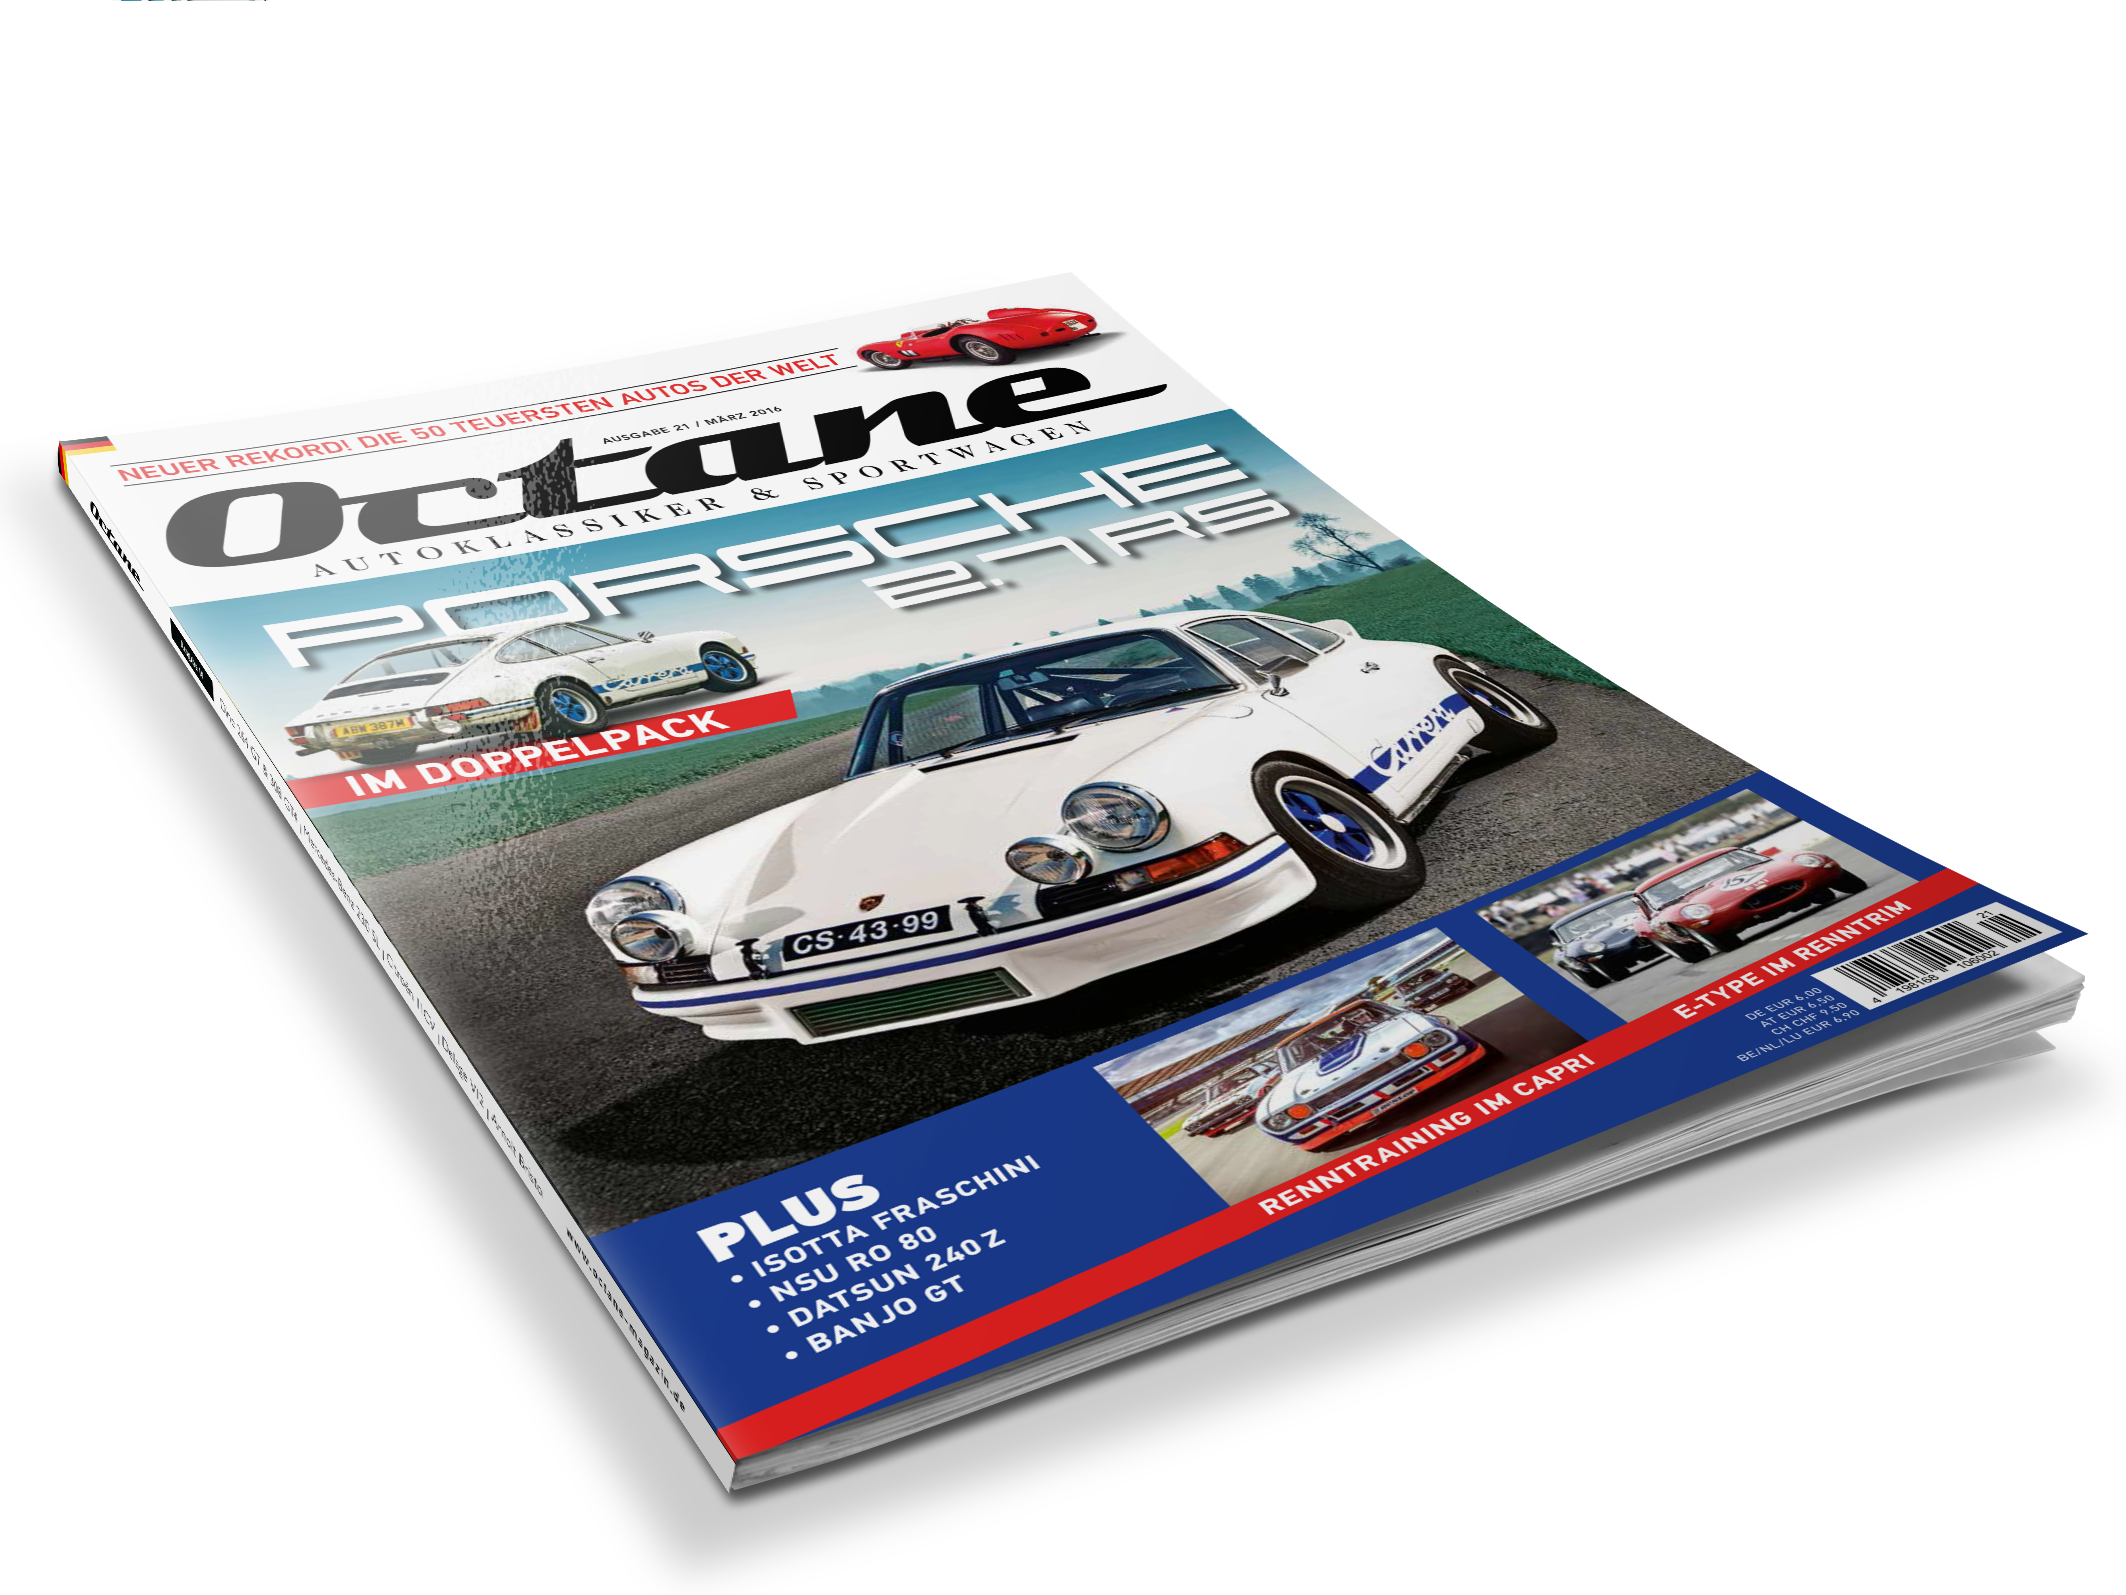 #21, OCTANE, Porsche 911 RS 2.7, Morgan Threewheeler, Ferrari 375 MM Spider, Datsun 240Z,, Ford Capri, Banjo GT Coupé